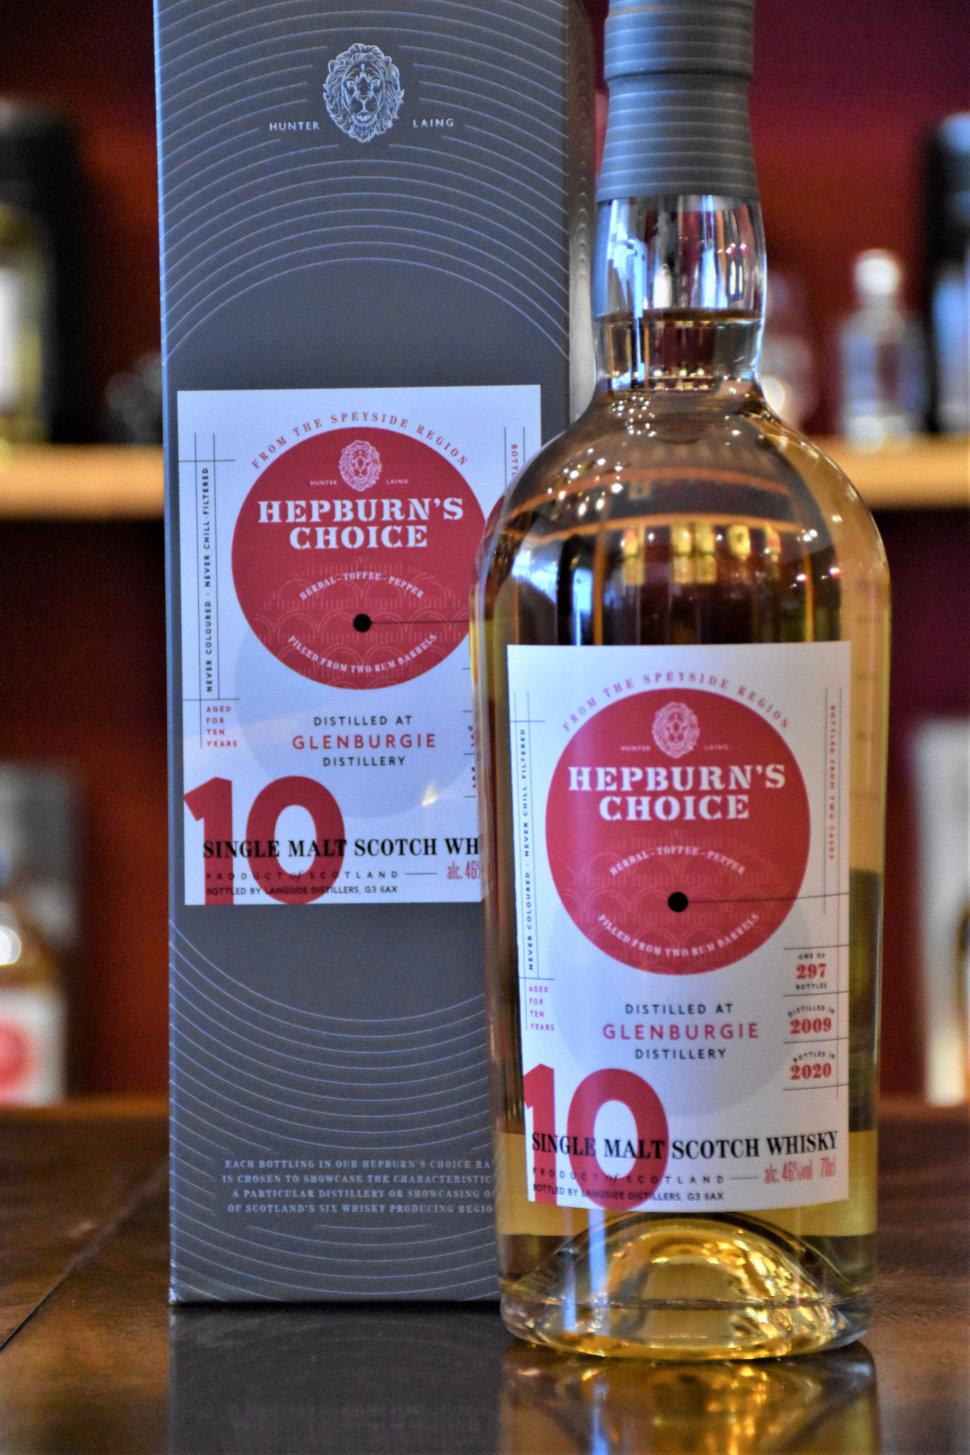 Glenburgie 2009, 10 y.o. - Rum Finish, 46% Alc.Vol., Hepburn´s Choice